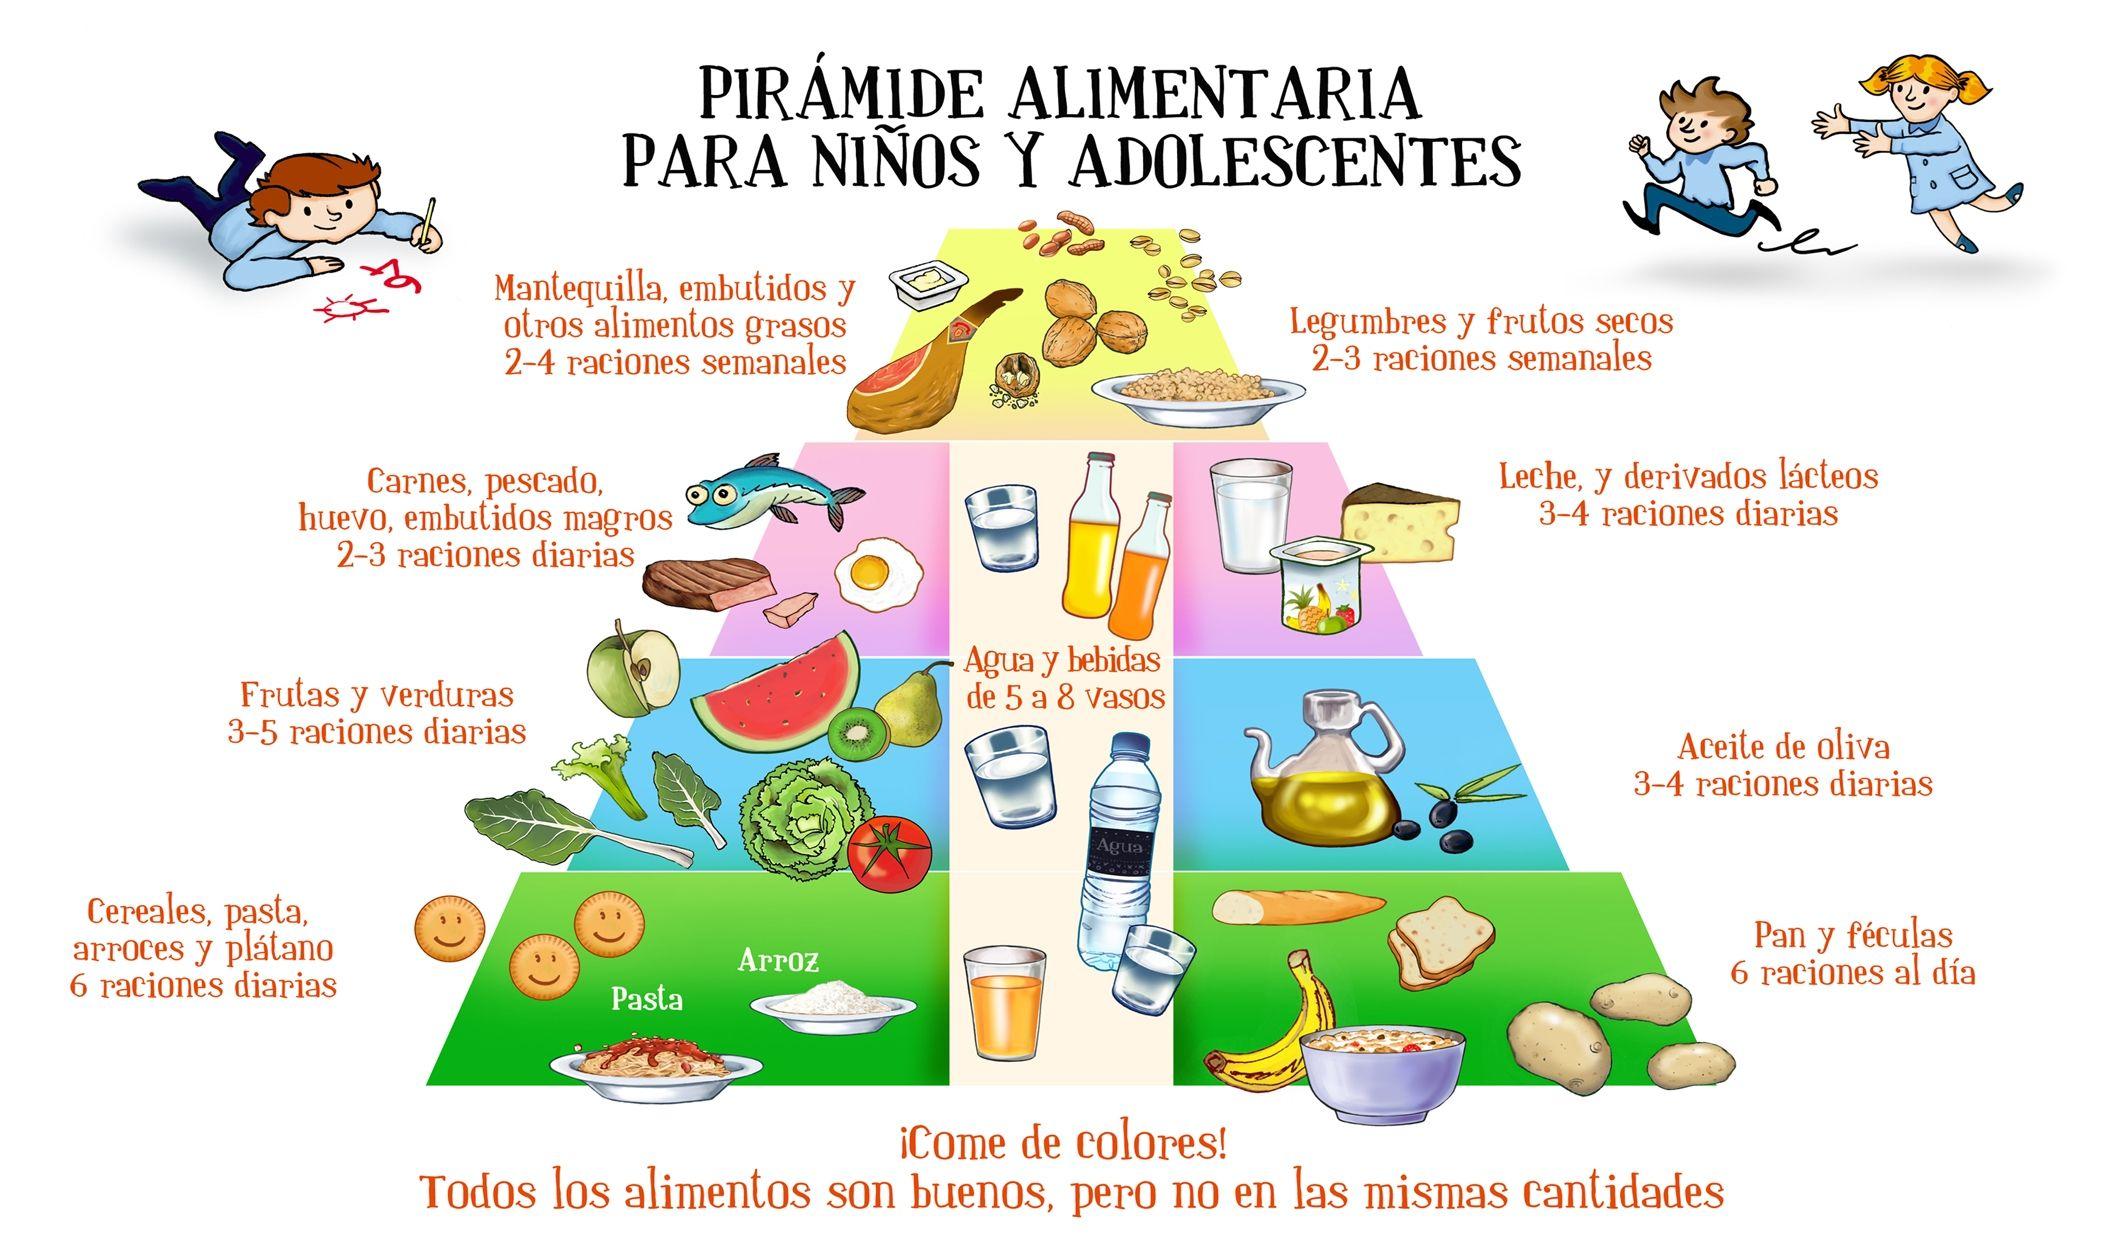 Piramide Alimentaria Para Adolescentes